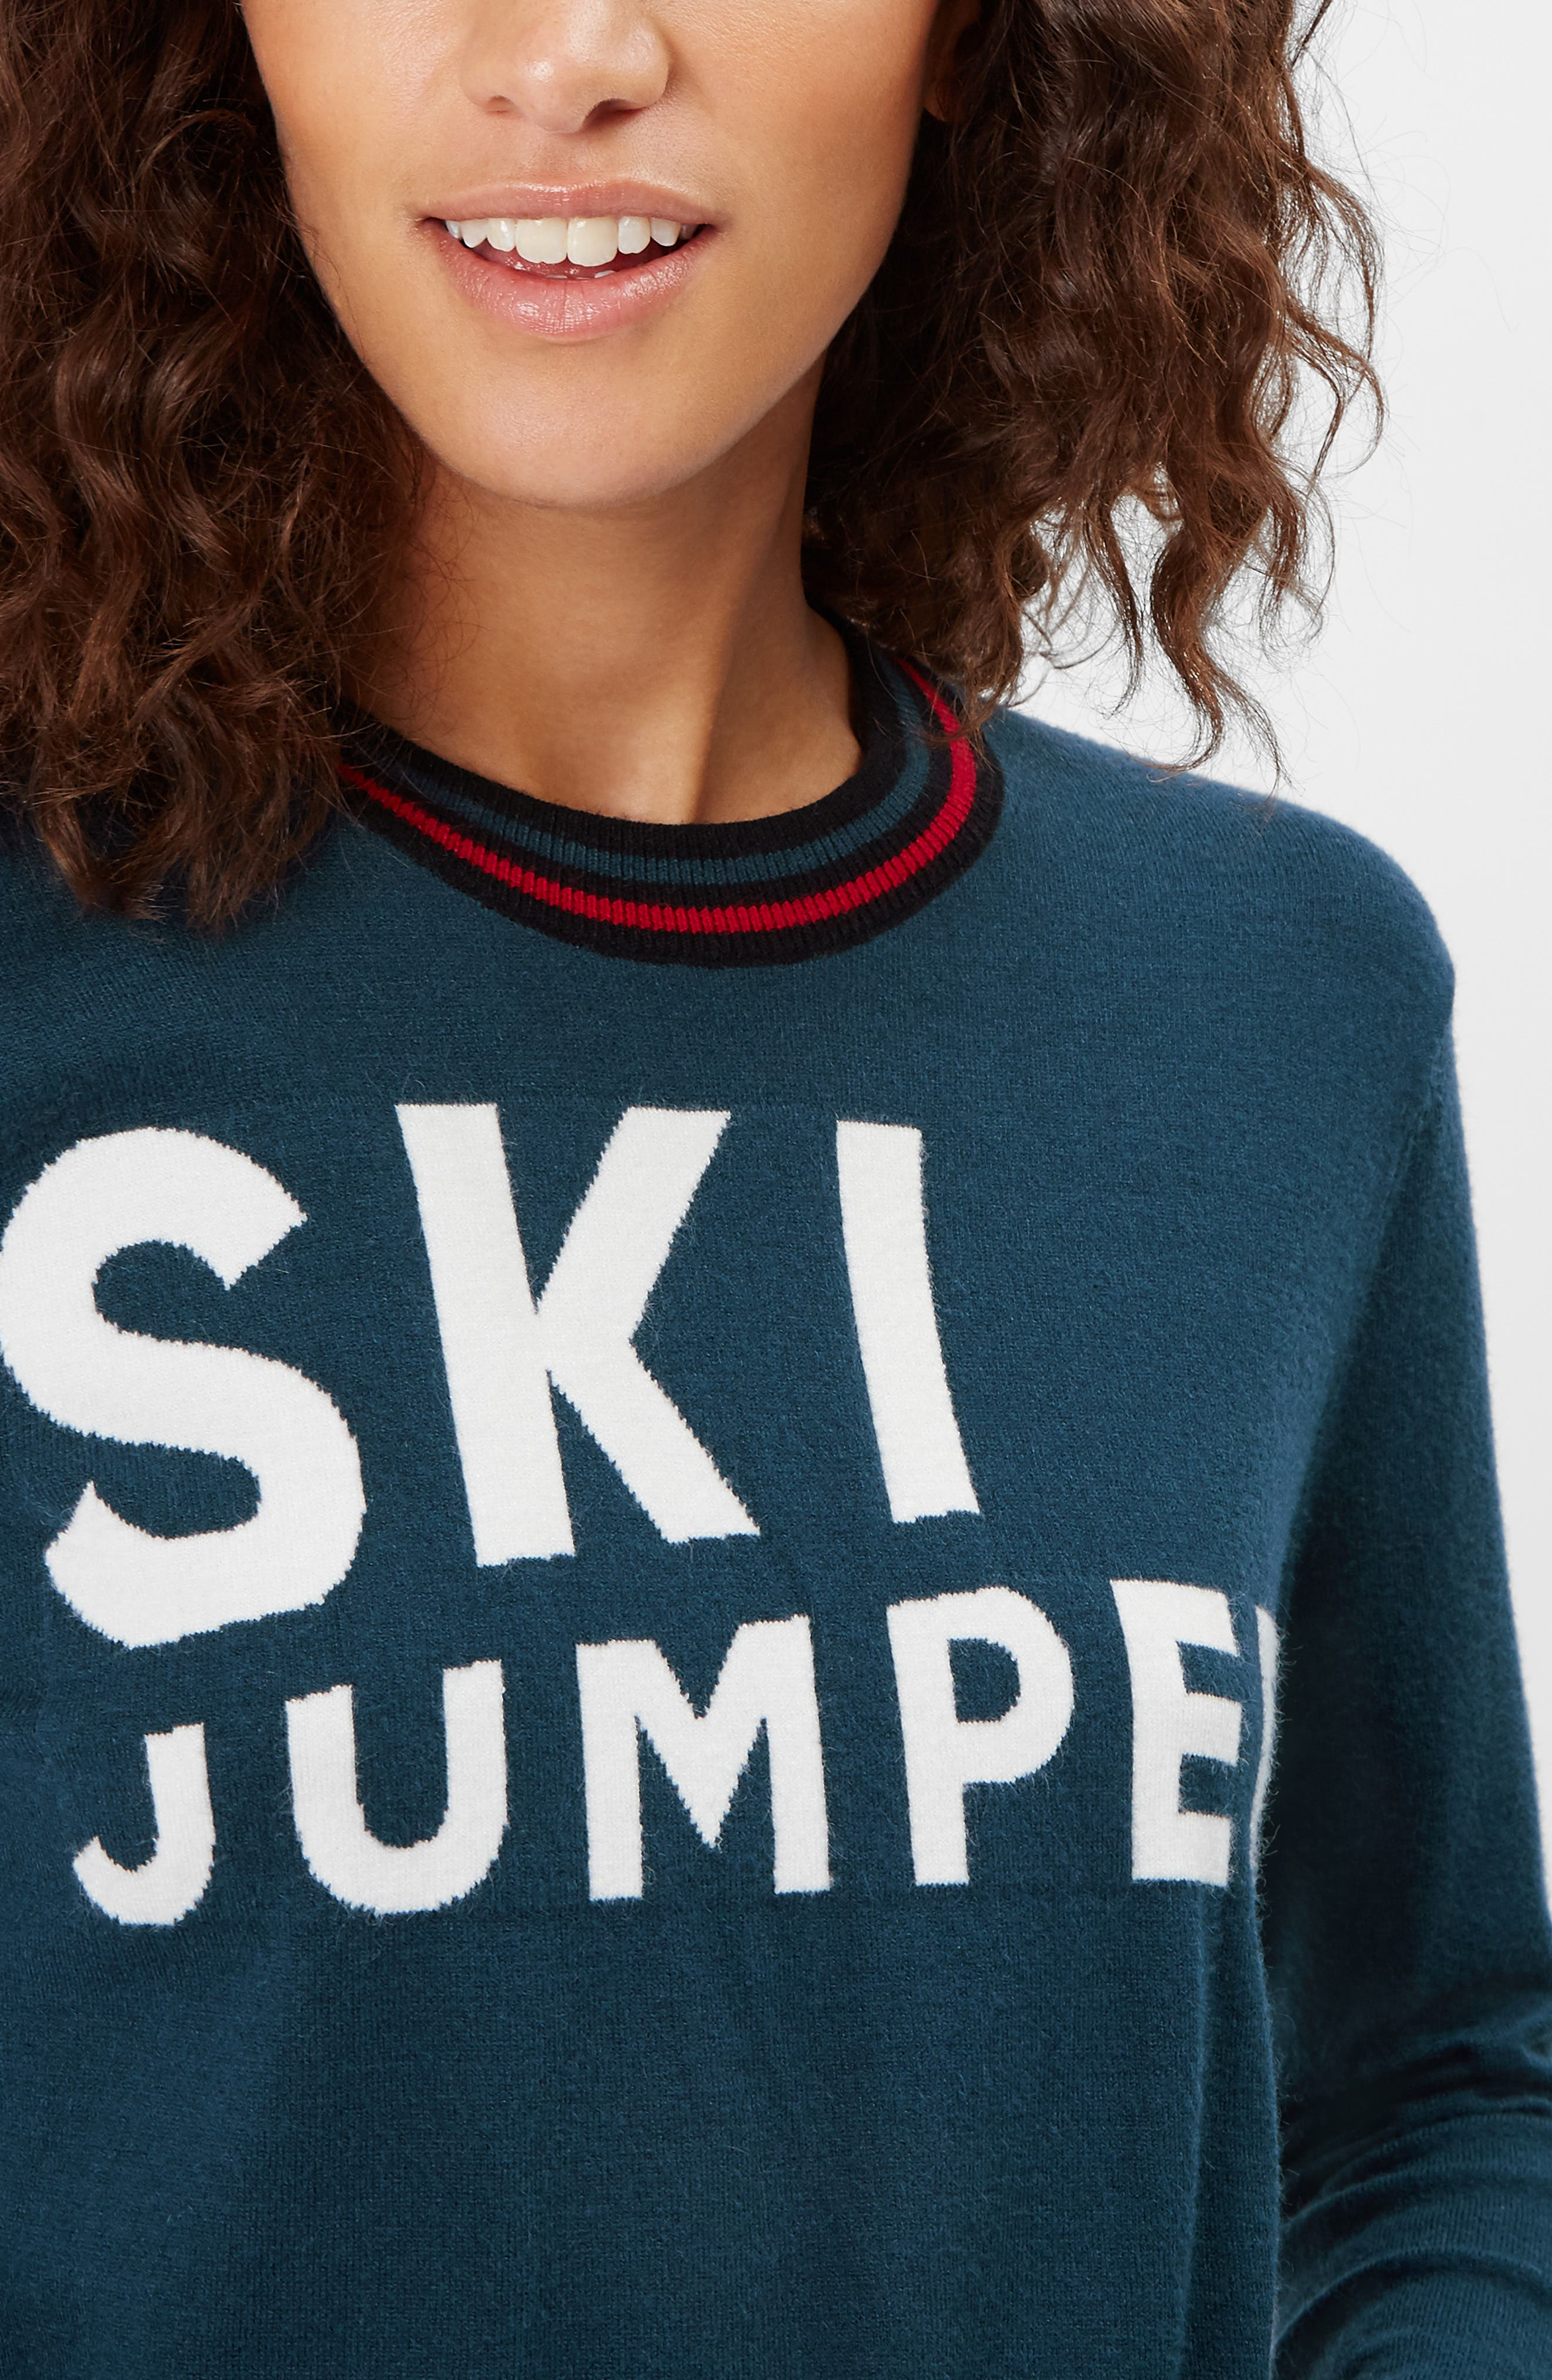 Ski Jumper Sweater,                             Alternate thumbnail 7, color,                             BEETLE BLUE